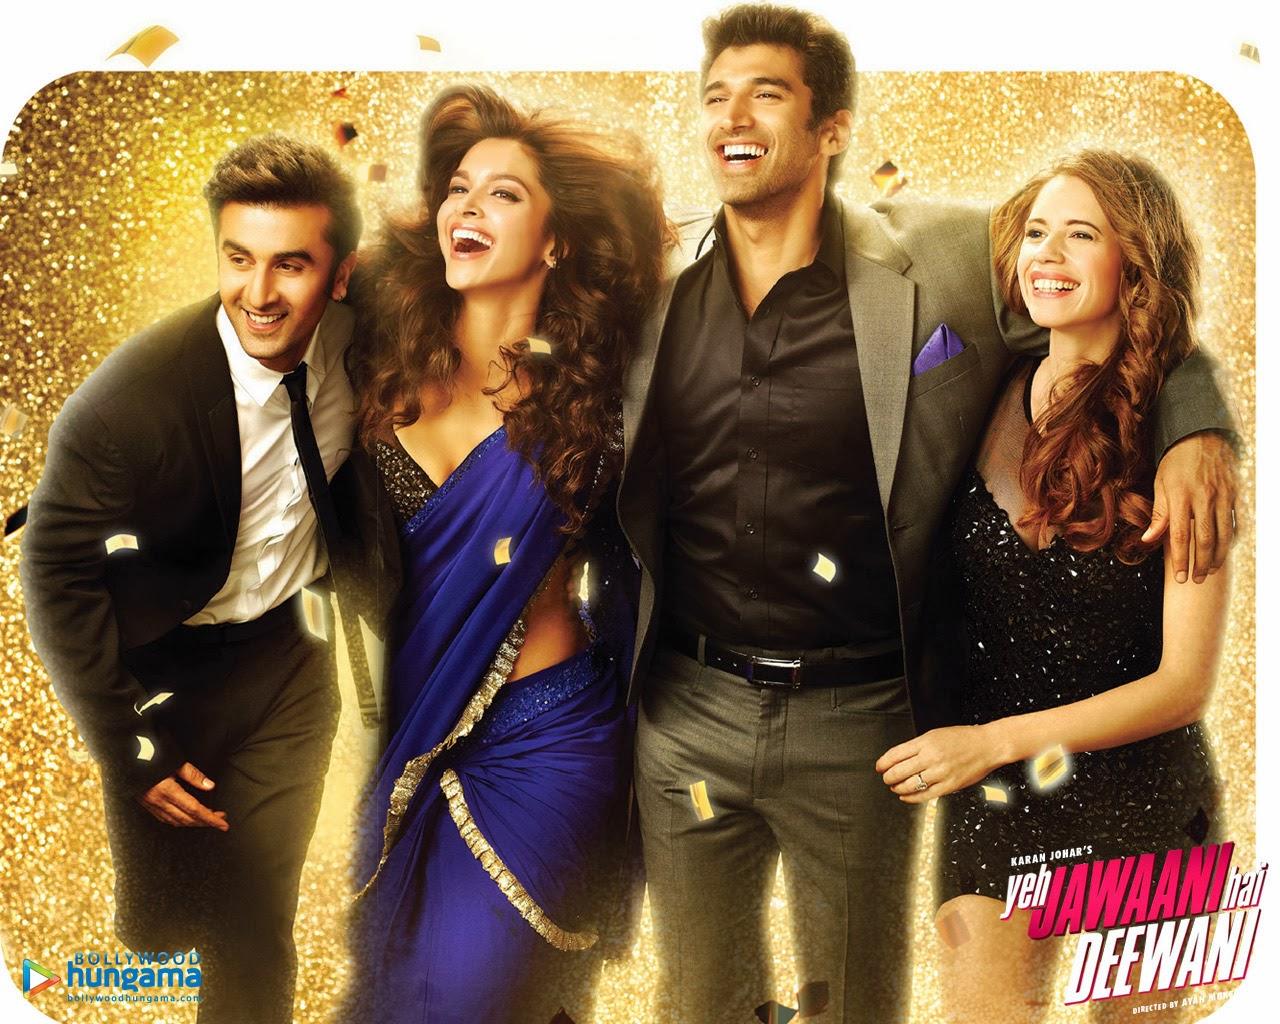 Celebritywallss Yeh Jawaani Hai Deewani Movie Wallpapers 2013